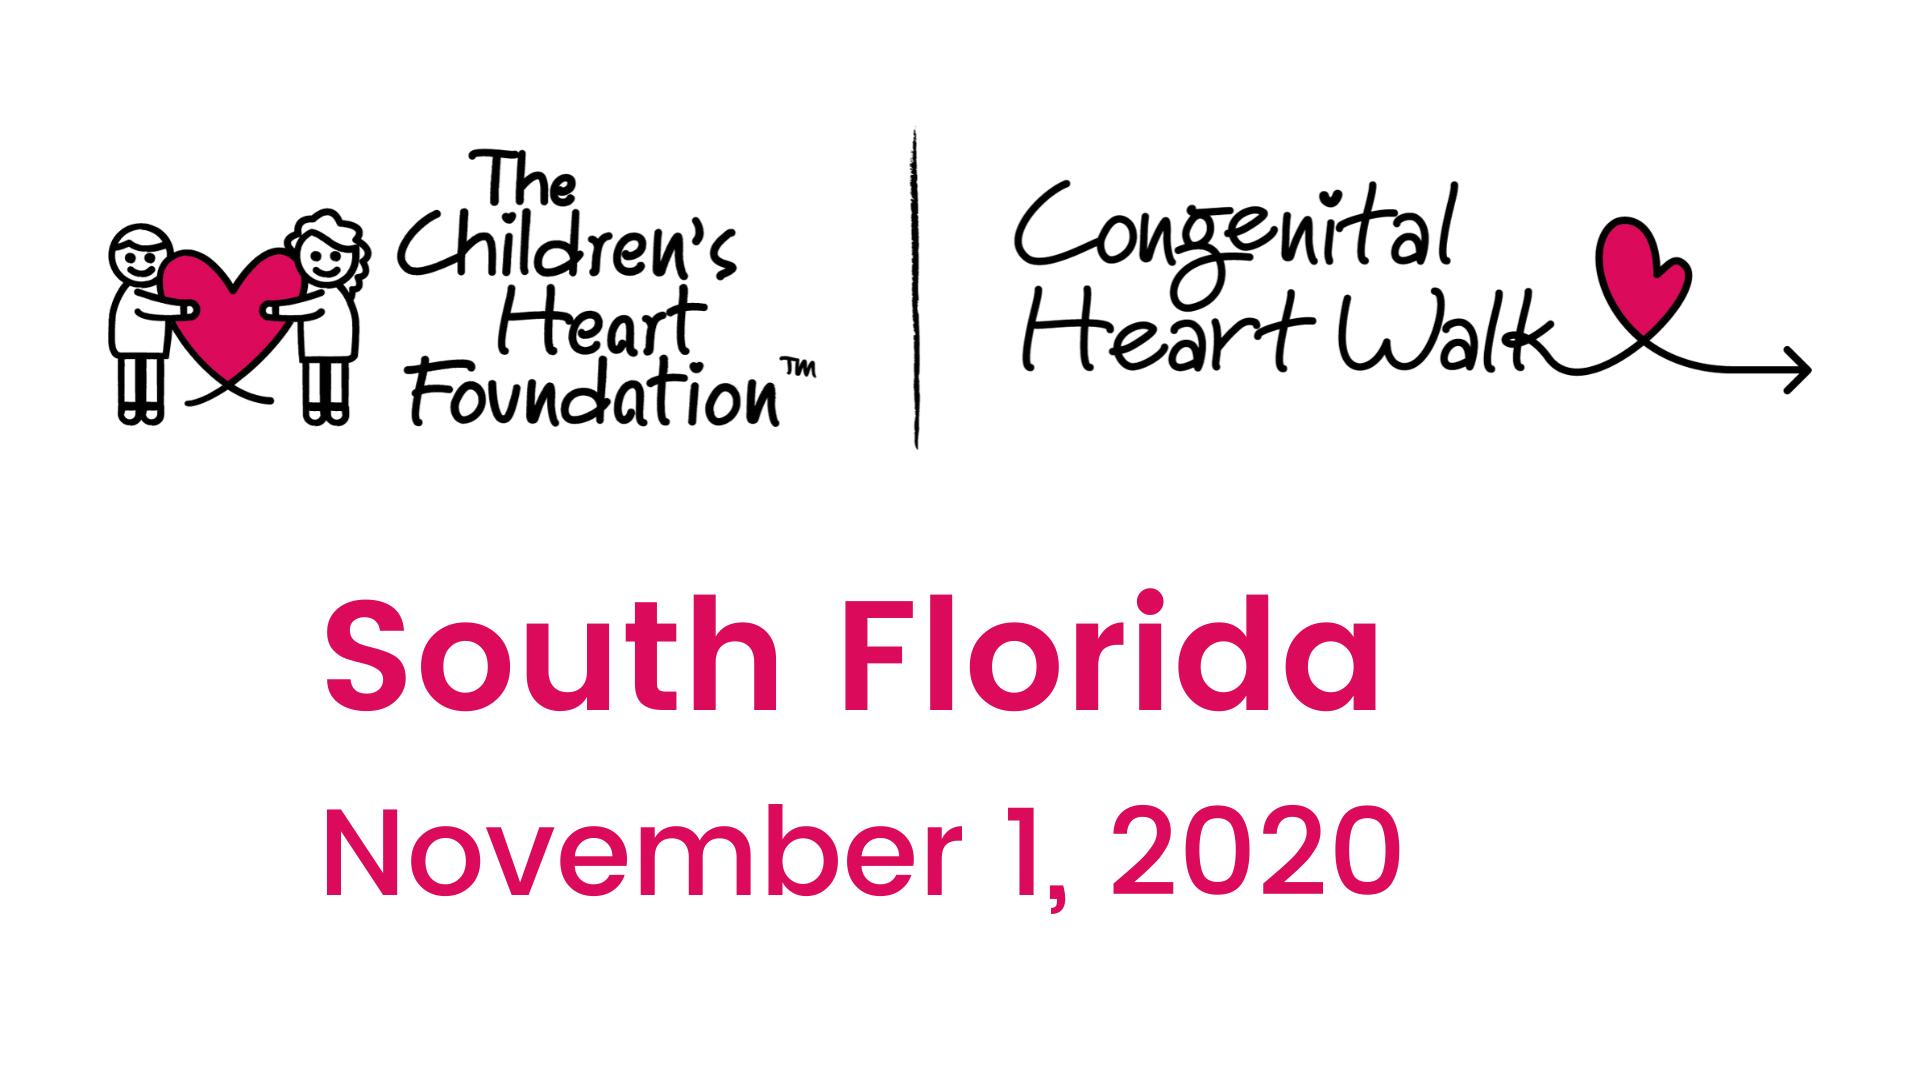 South Florida Congenital Heart Walk